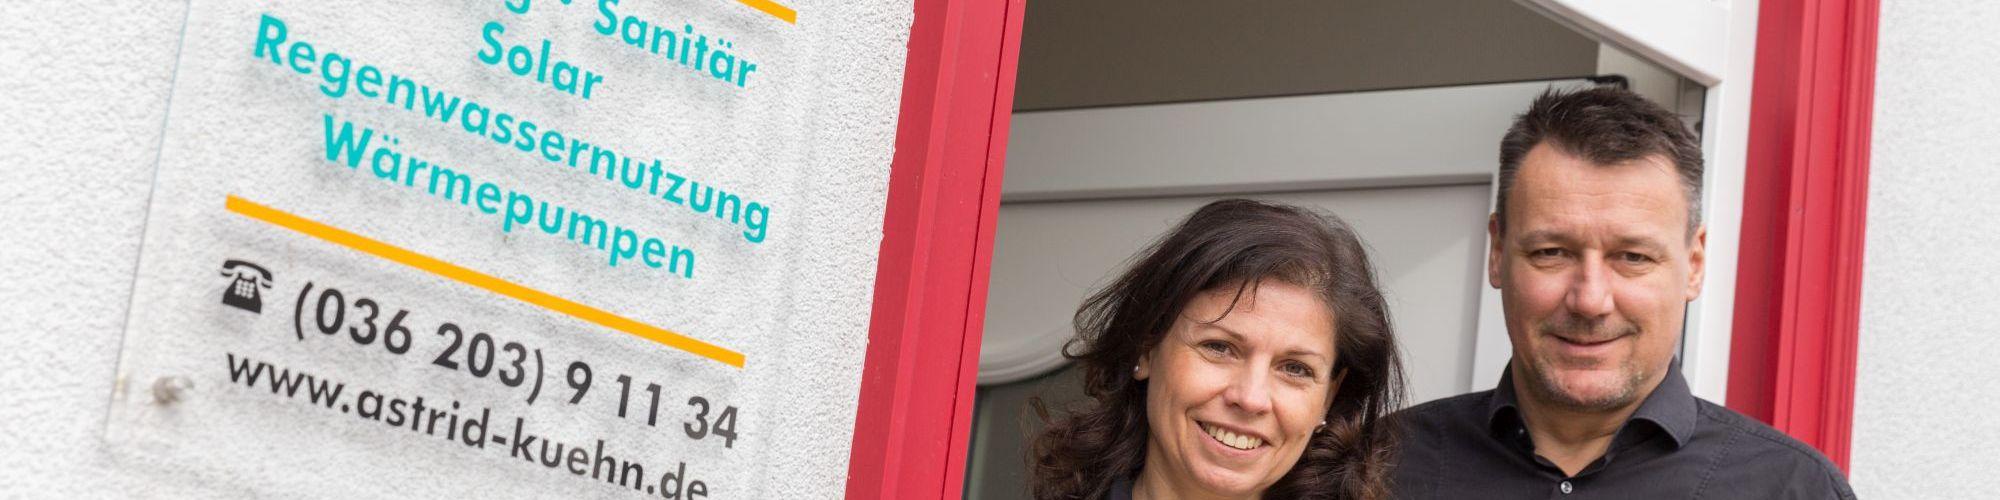 Astrid Kühn GmbH